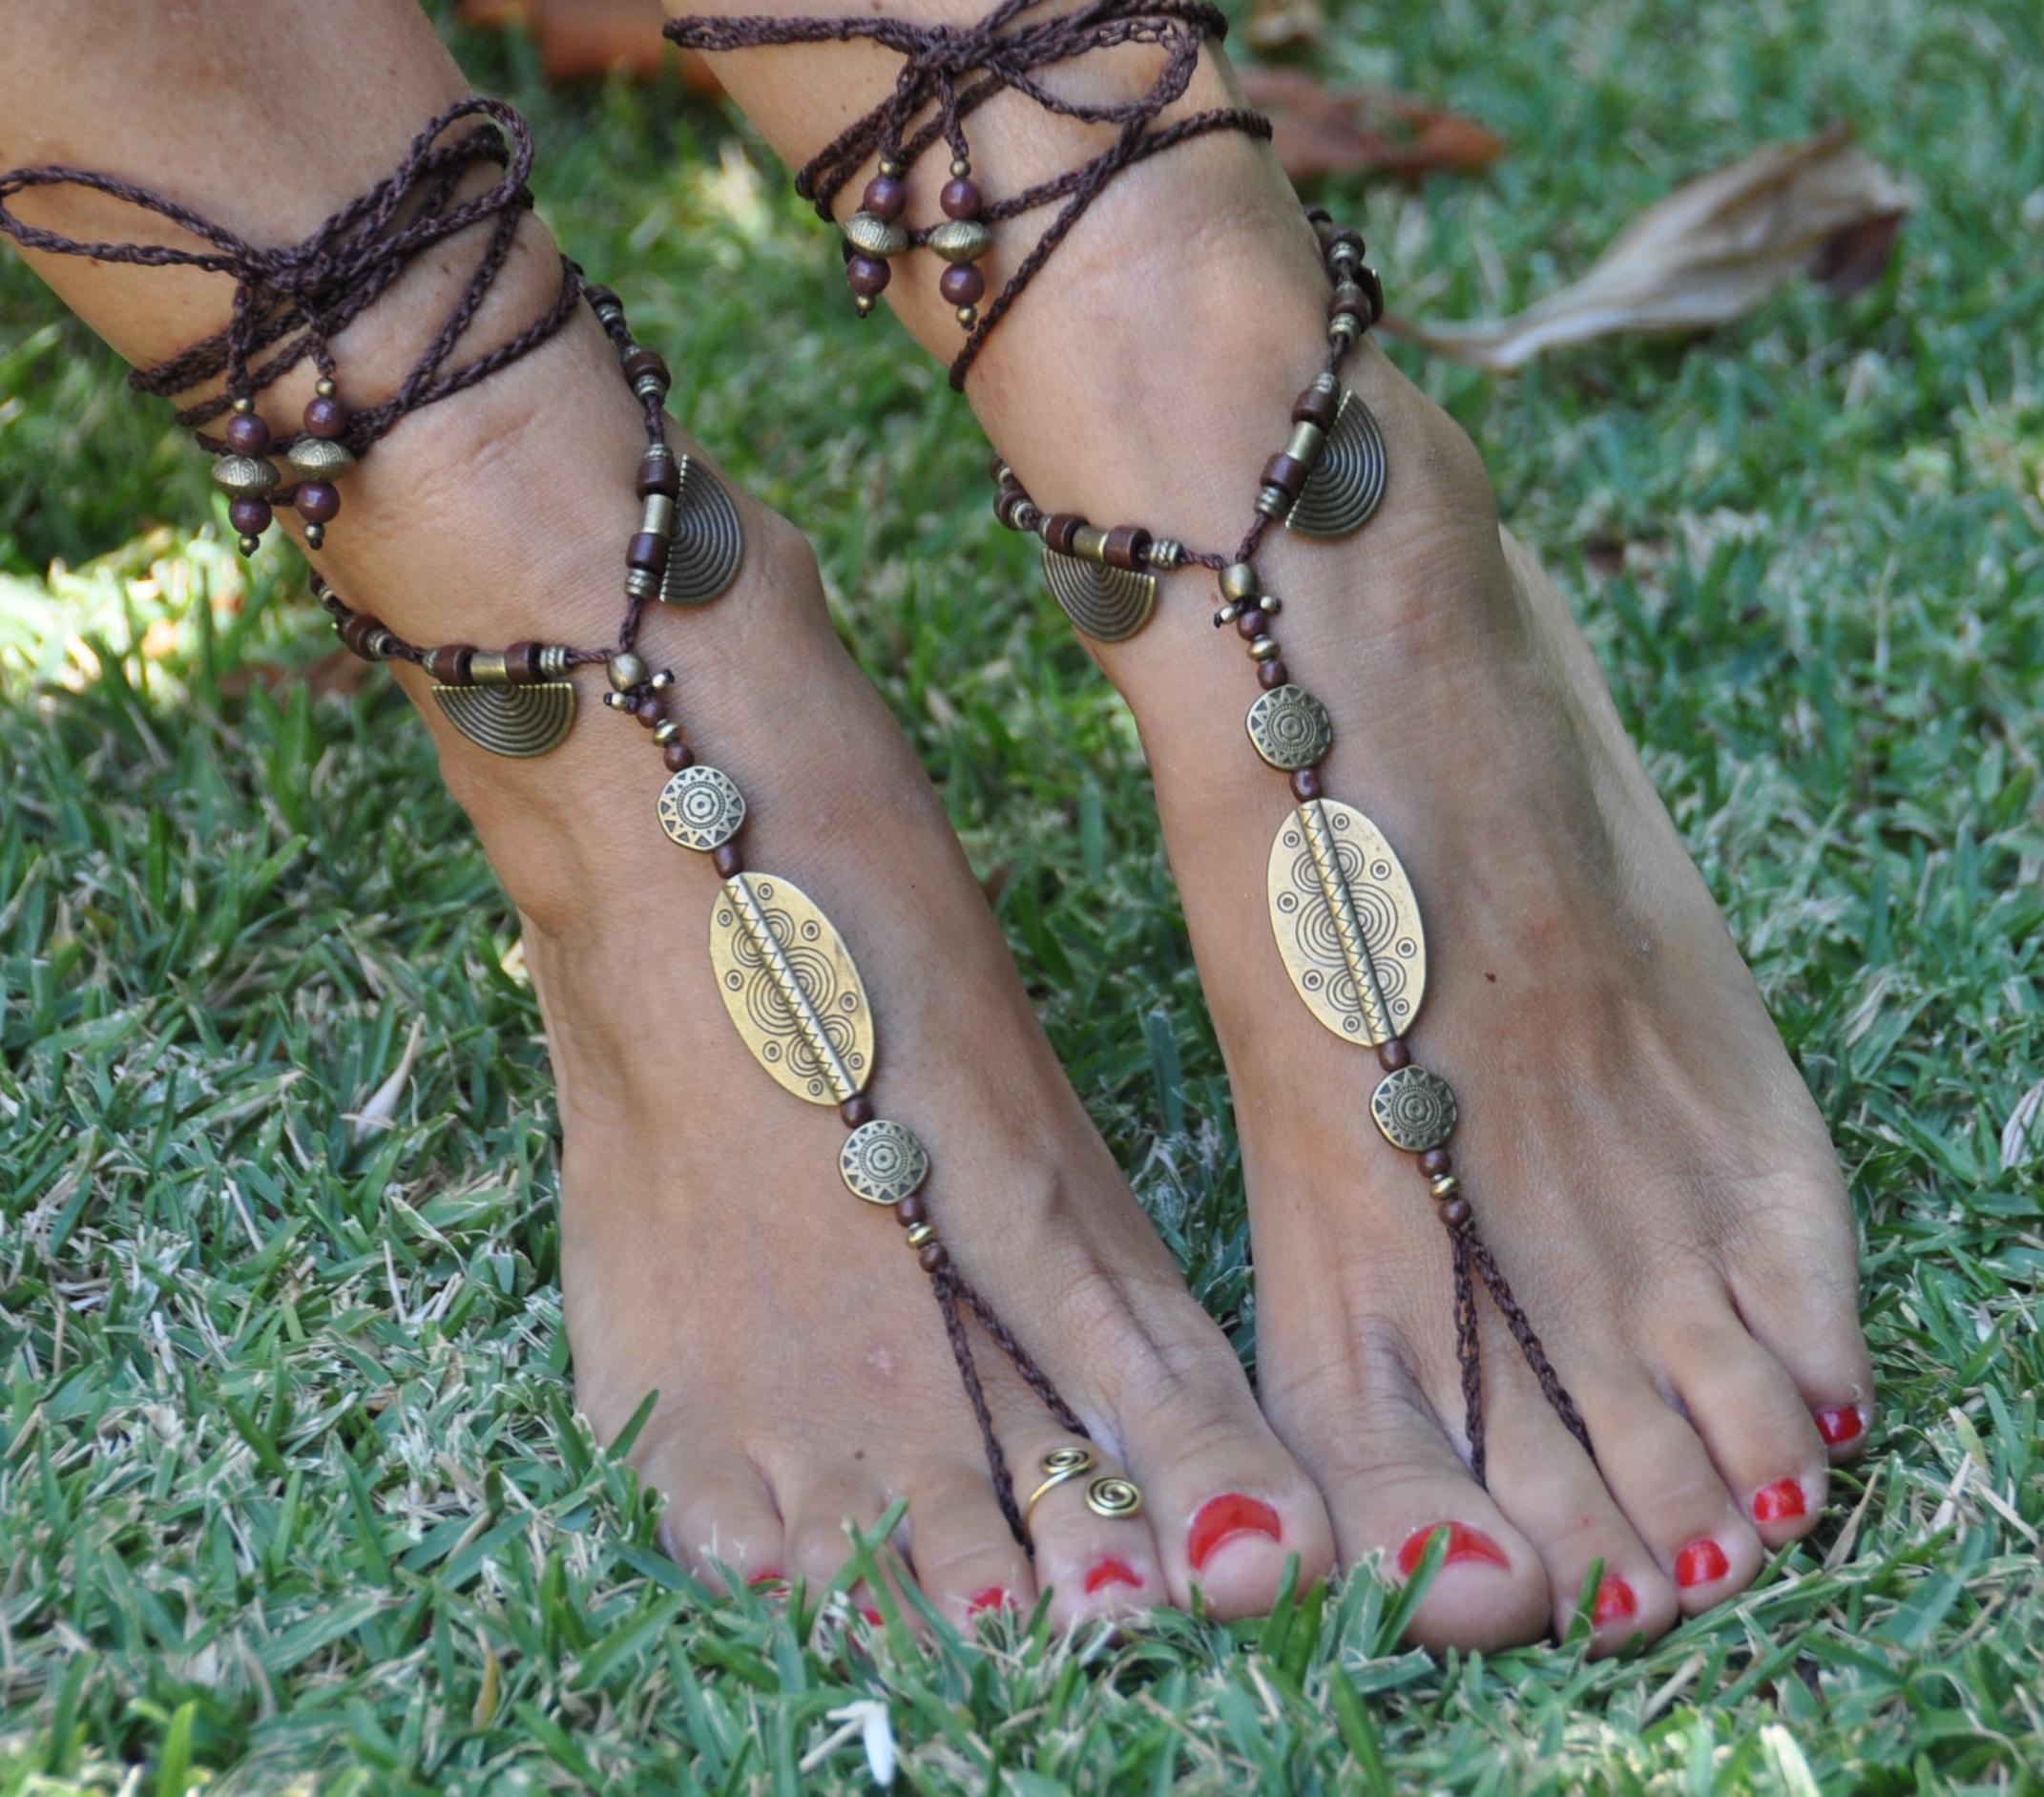 Foot jewelry Beaded crochet,Yoga accessories,Ethnic Tribal Wear BROWN Choco/&Coffee BAREFOOT SANDALS Hippie Beach Wedding